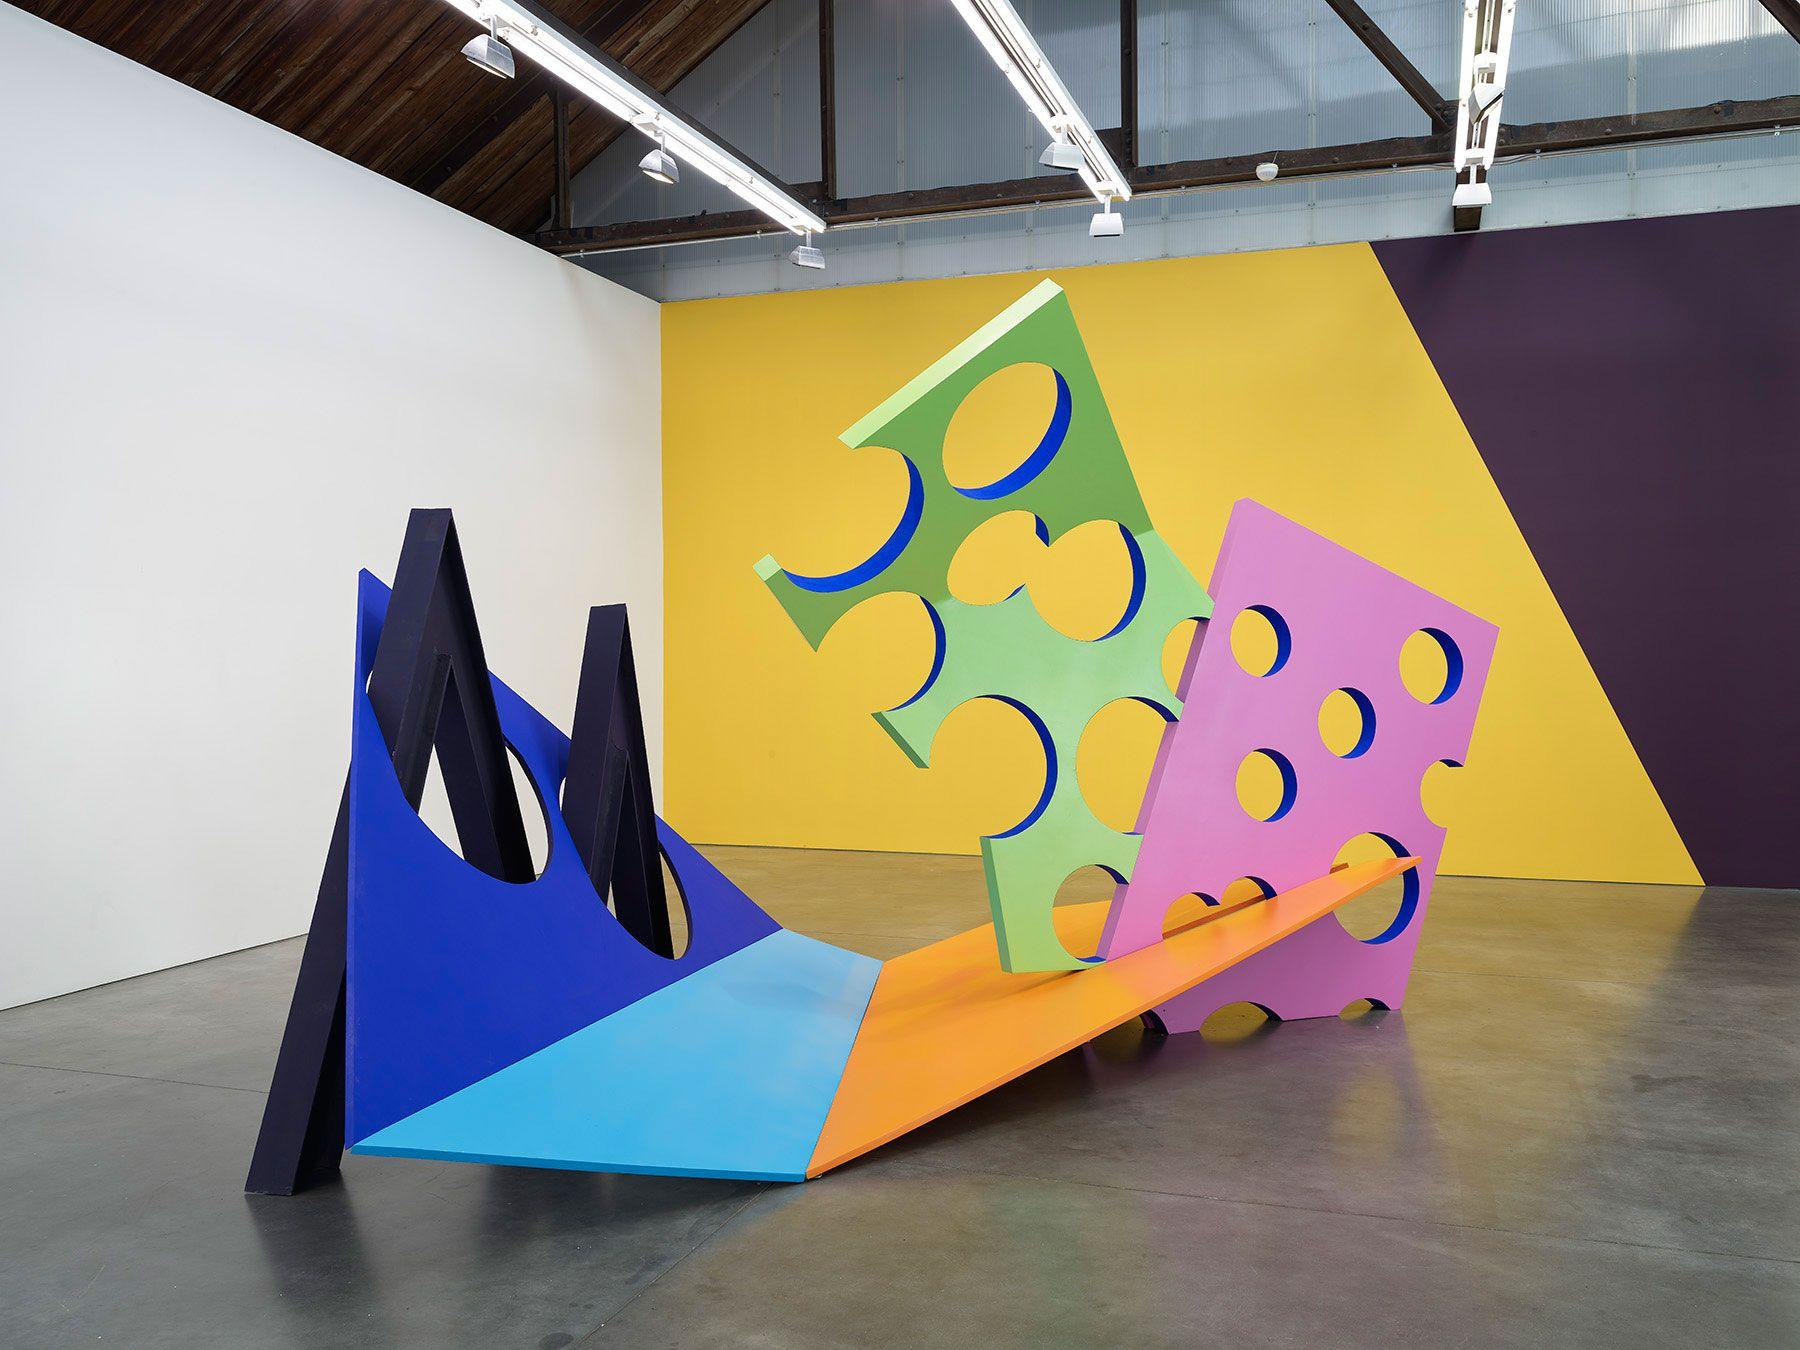 Phillip King, Swirl, 2018